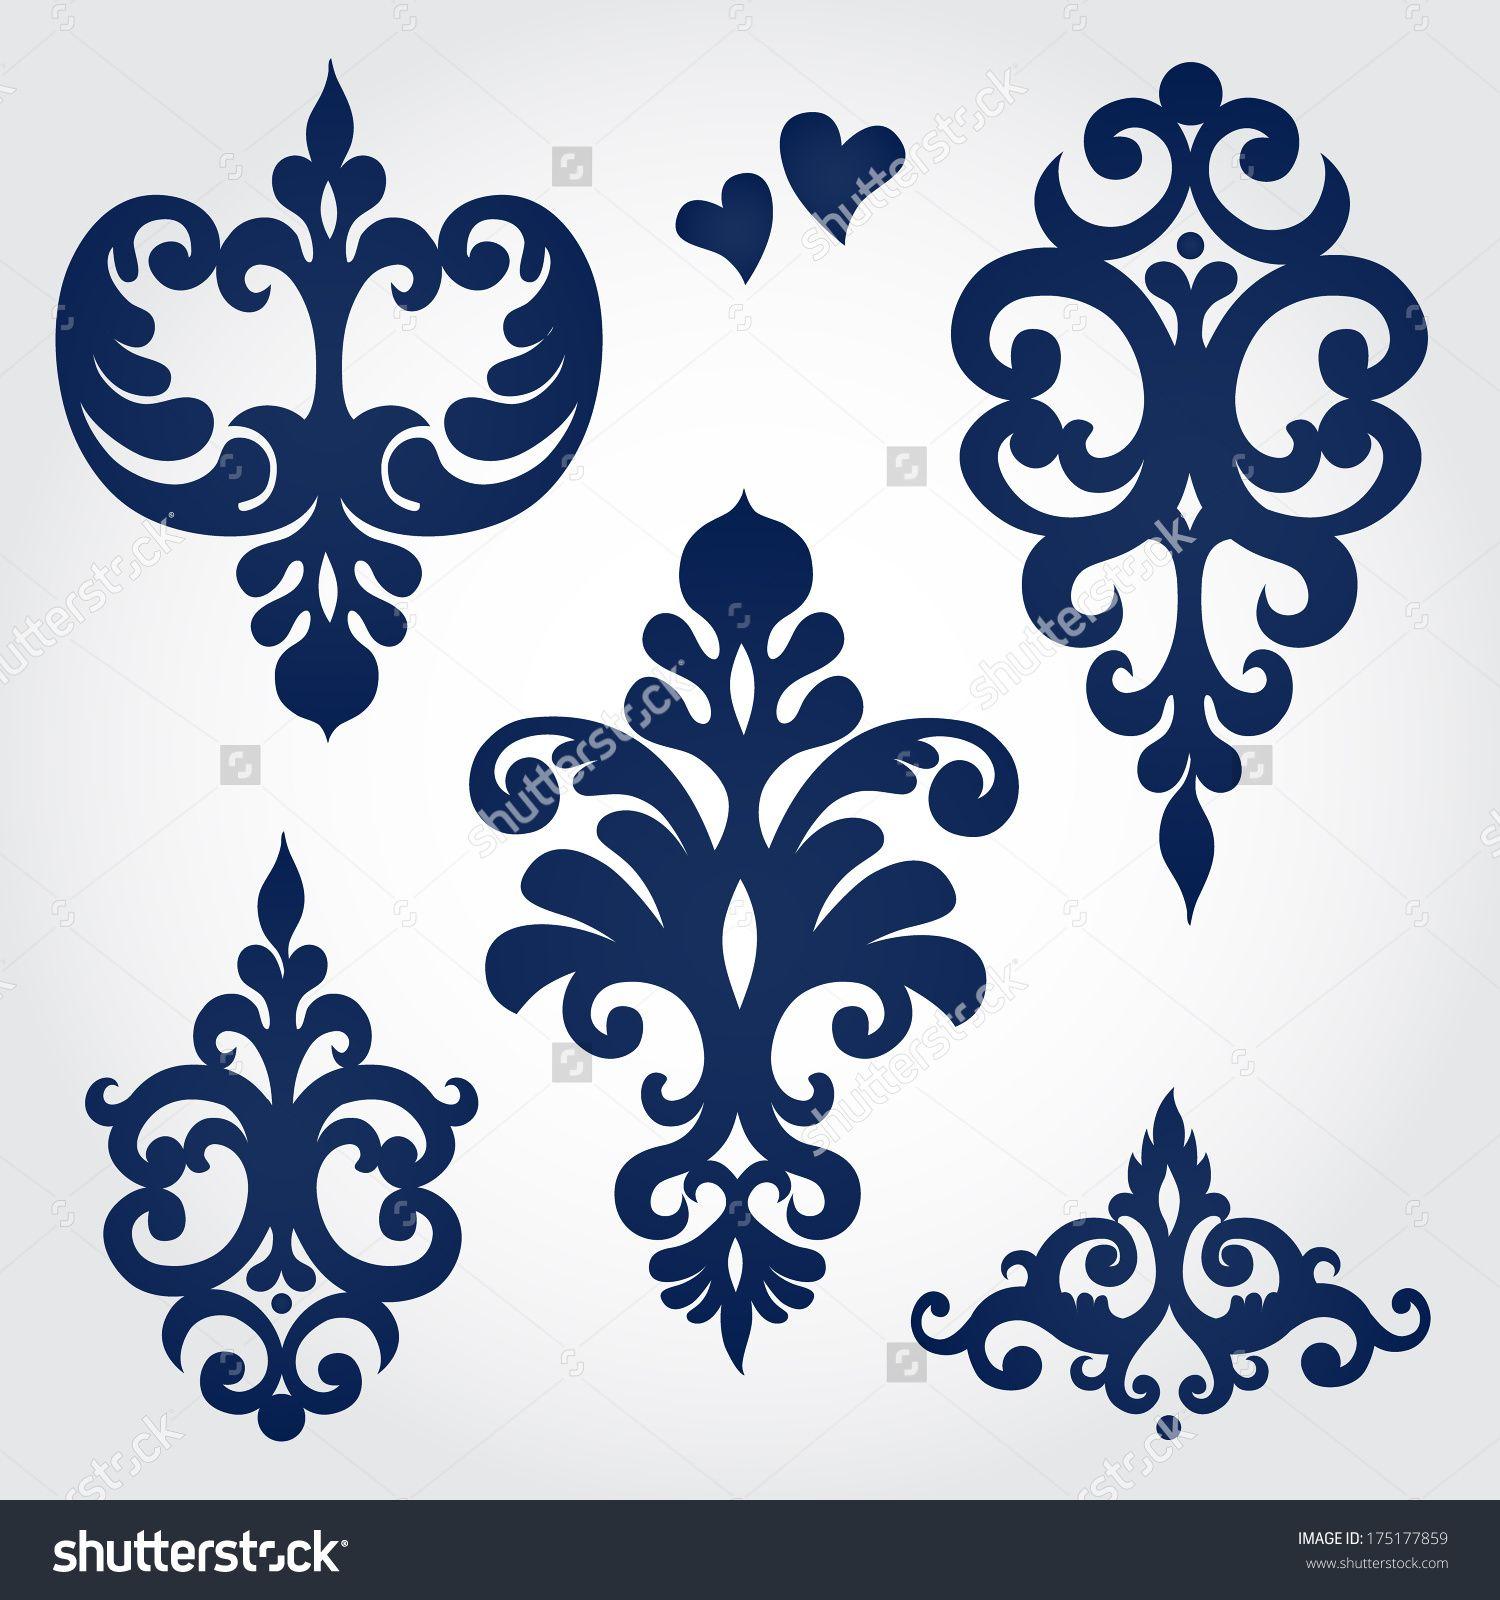 Vector set with baroque ornaments in victorian style ornate vector set with baroque ornaments in victorian style ornate element for design it can doublecrazyfo Gallery